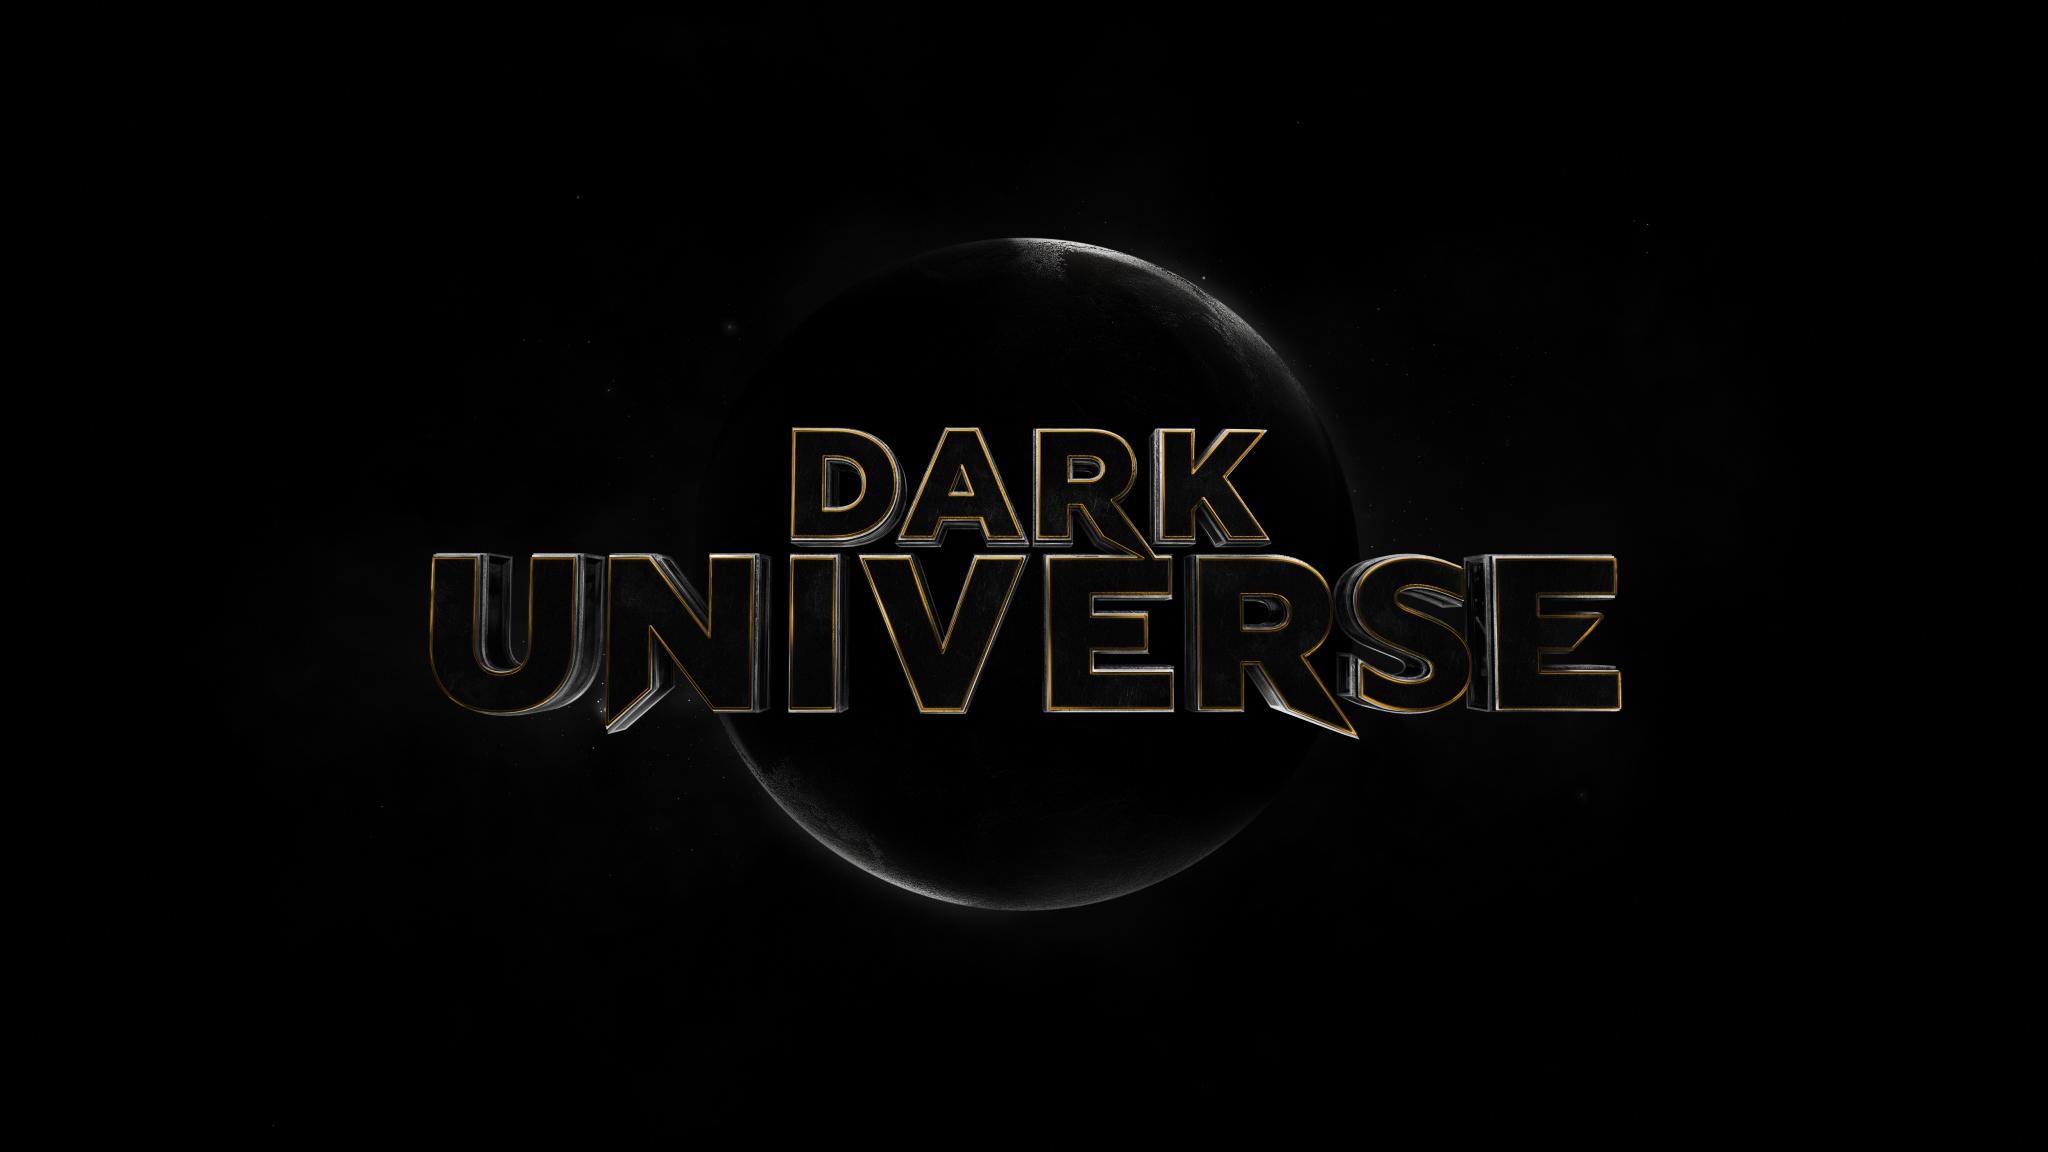 DARK_UNI_01_UNIVERSAL_v06h_AK_HD copy.jpg